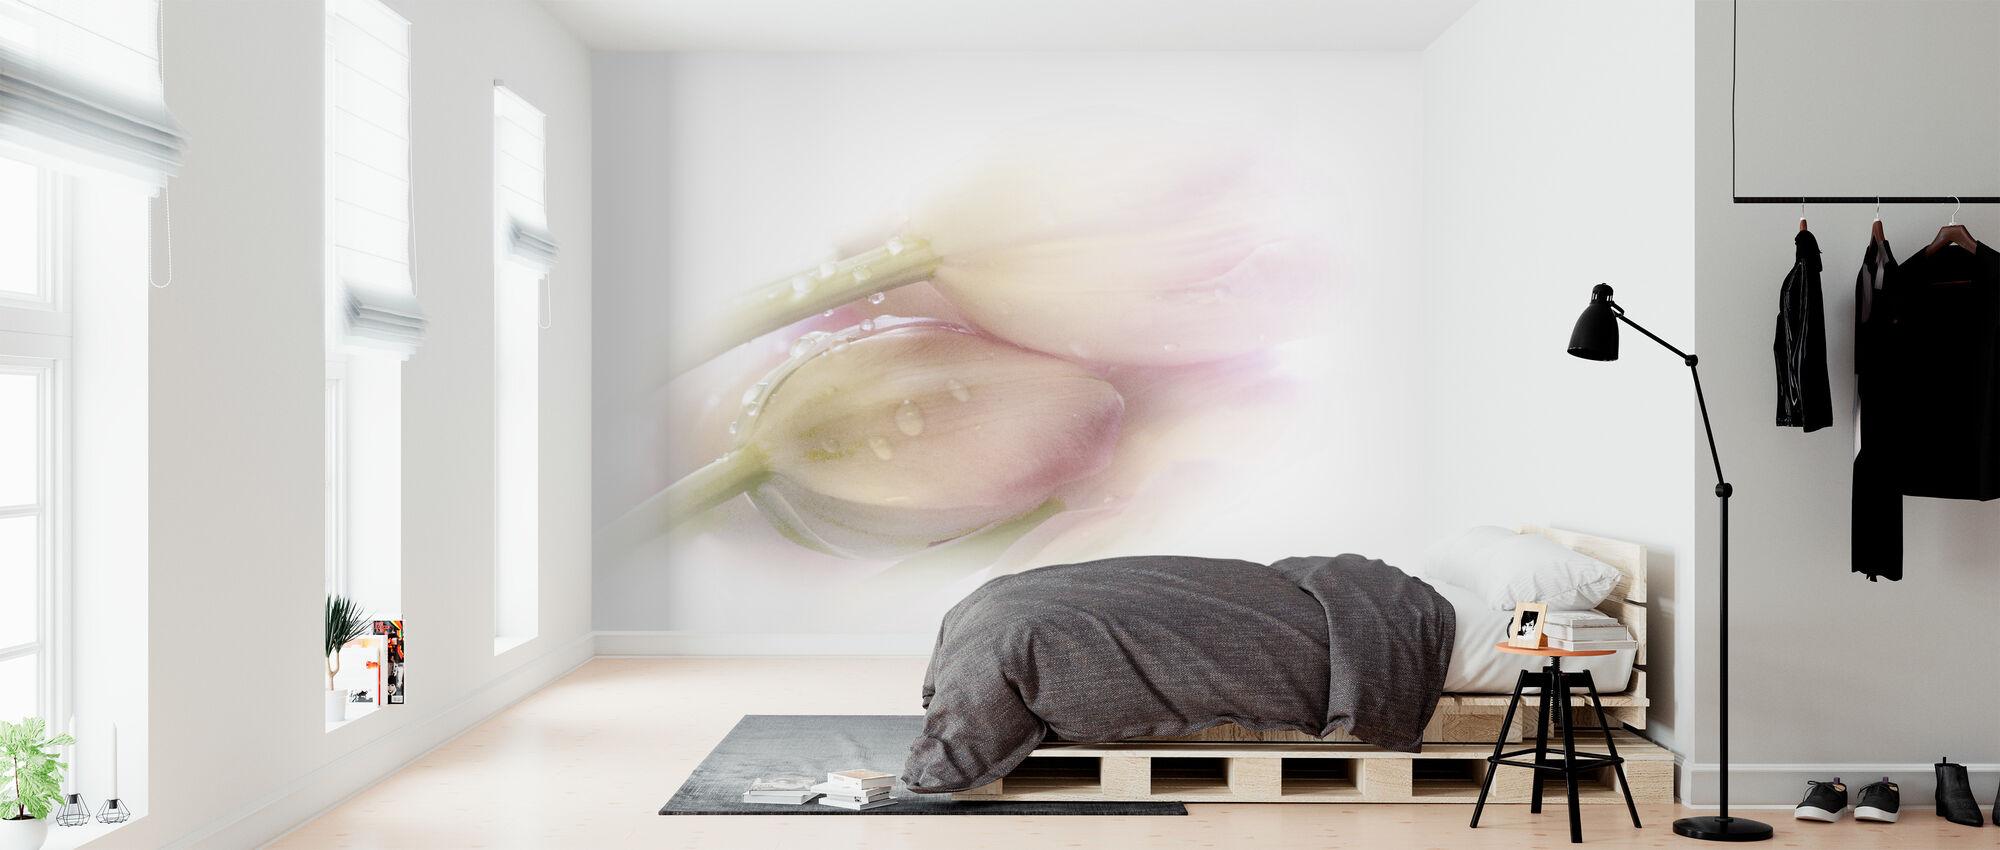 Rörande - Tapet - Sovrum